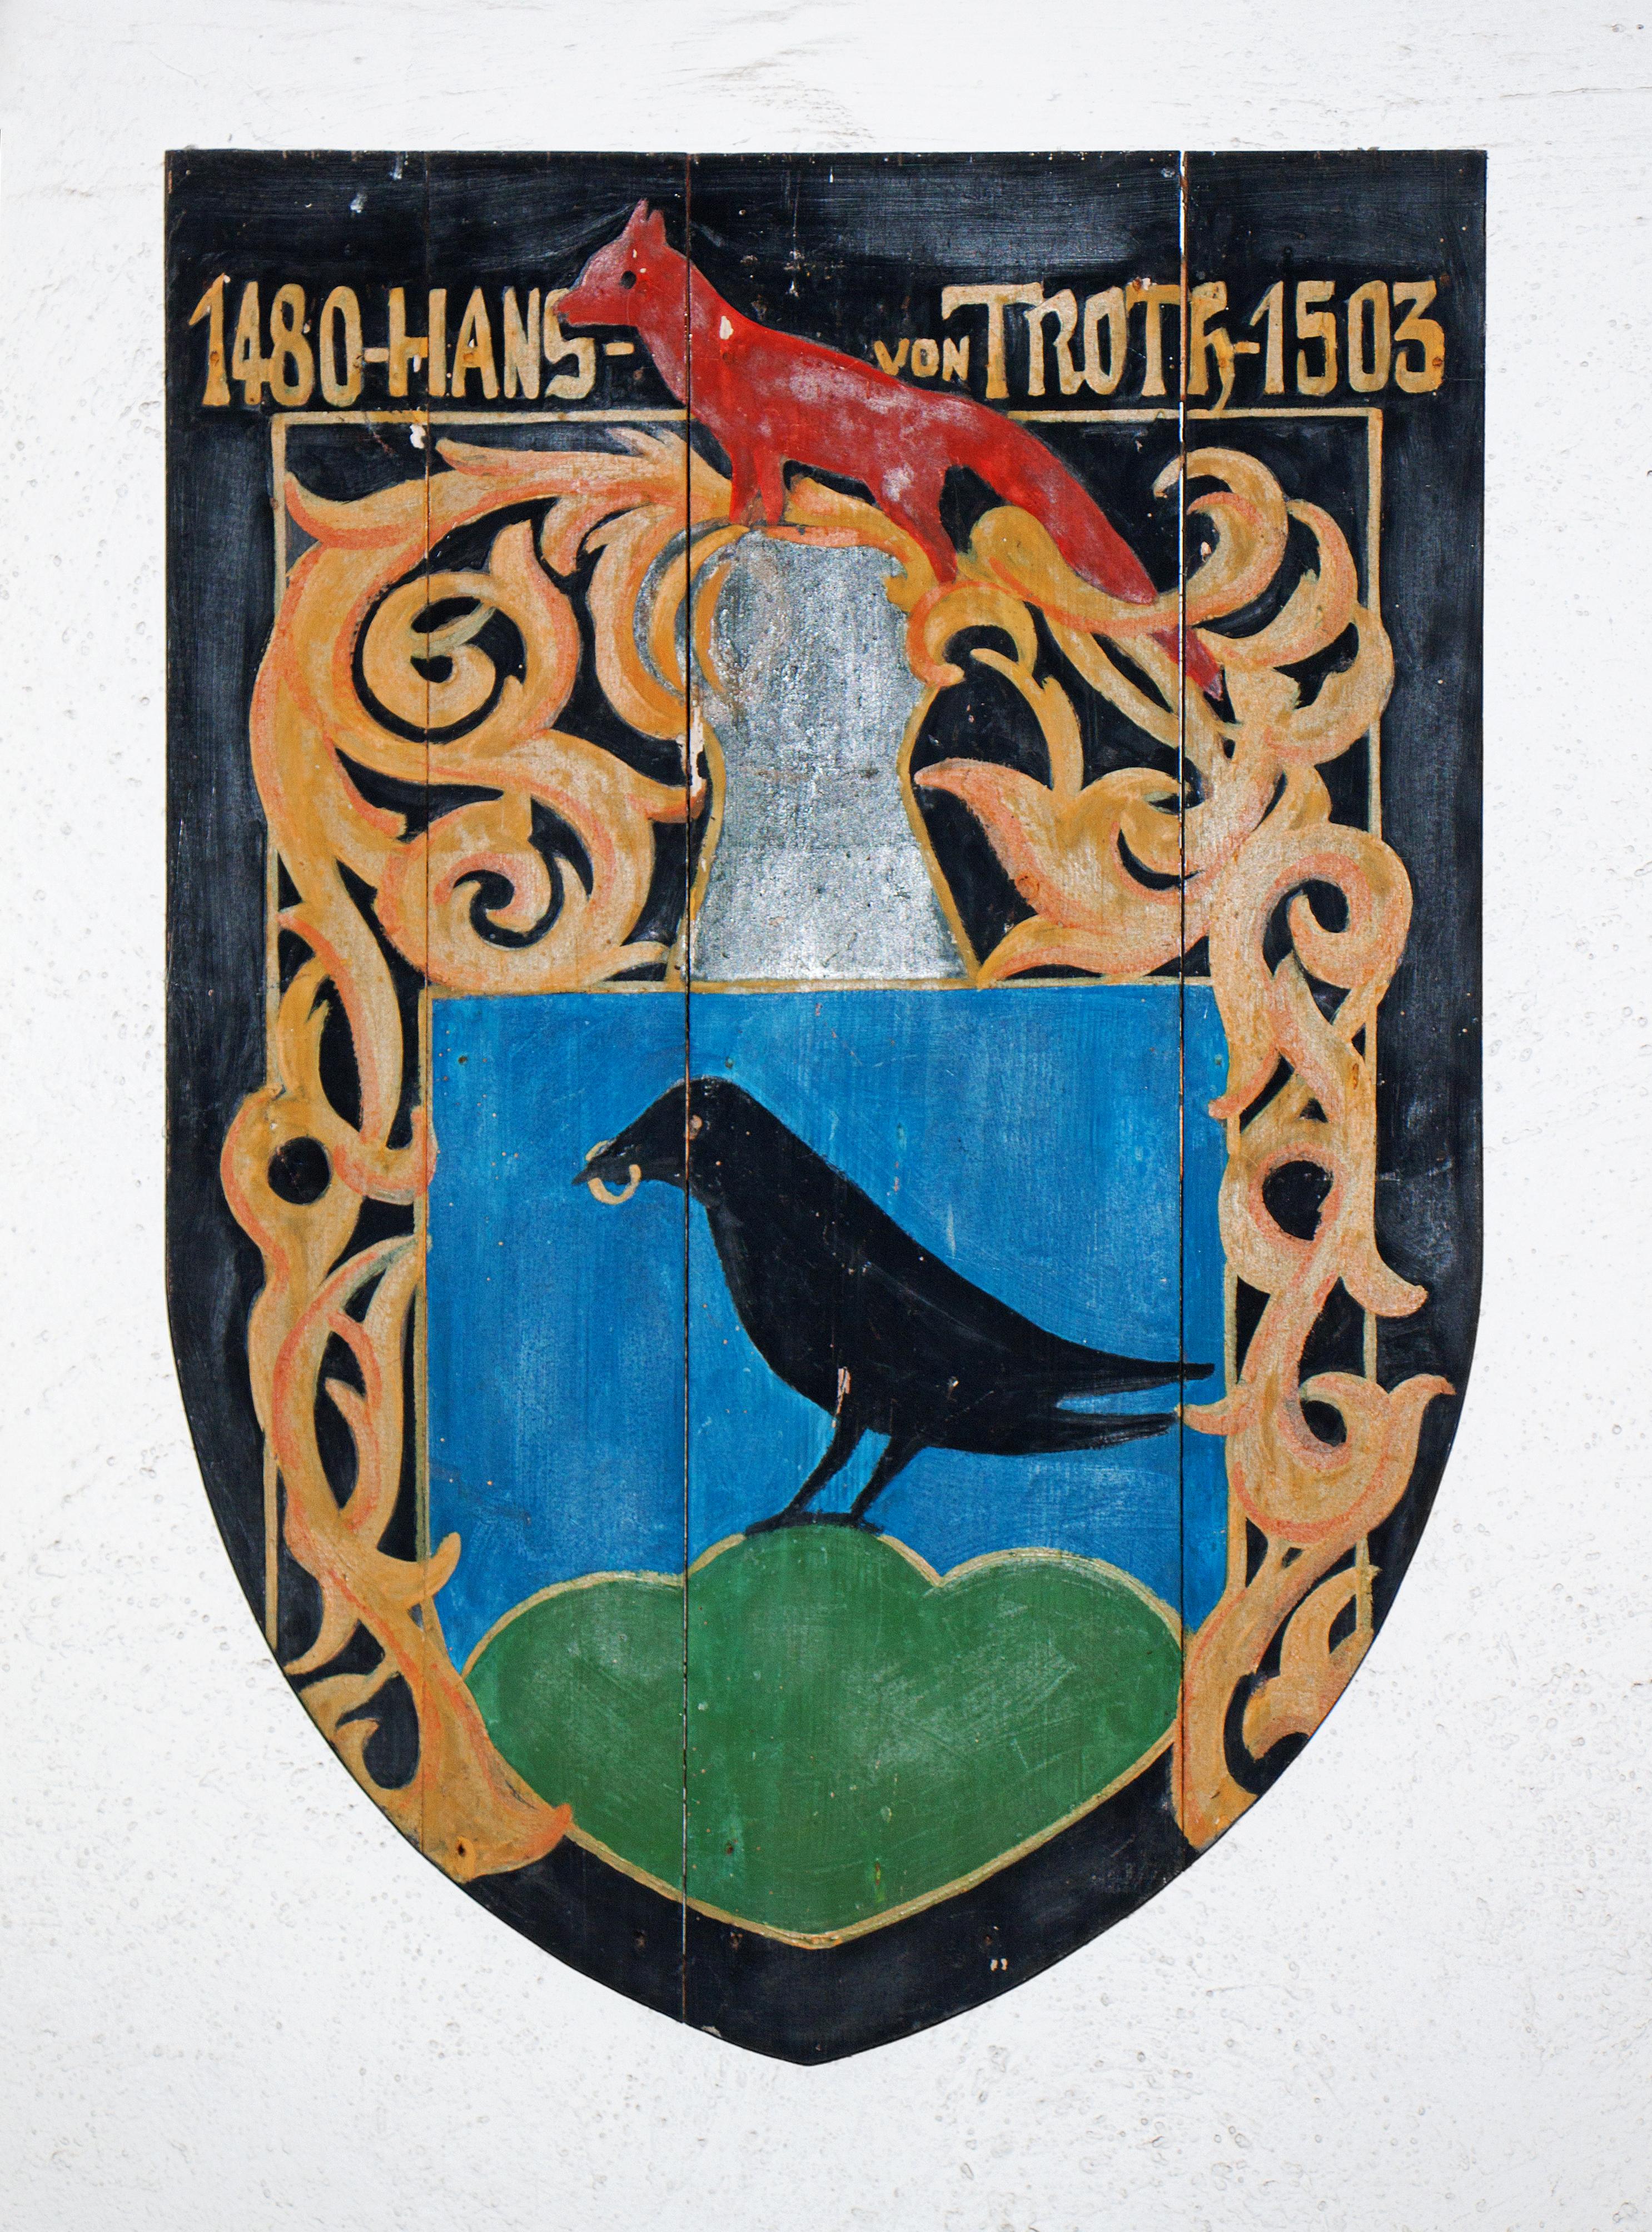 Coat of arms of Hans von Trotha